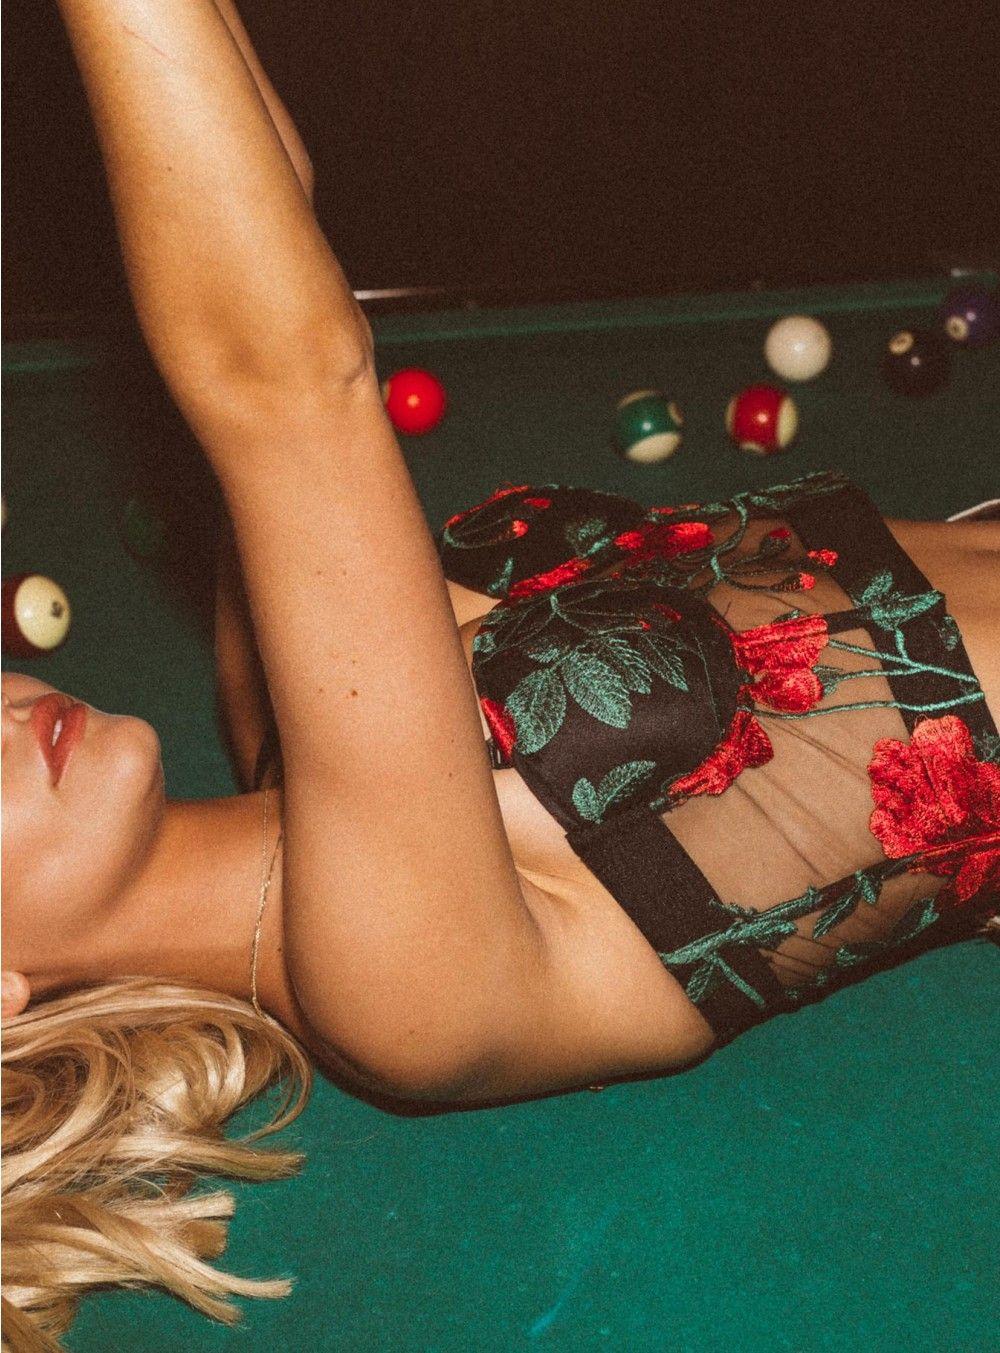 498f32610e1e02 Jagger & Stone Frida Rose Mesh Bustier - left side view | NASHVILLE ...